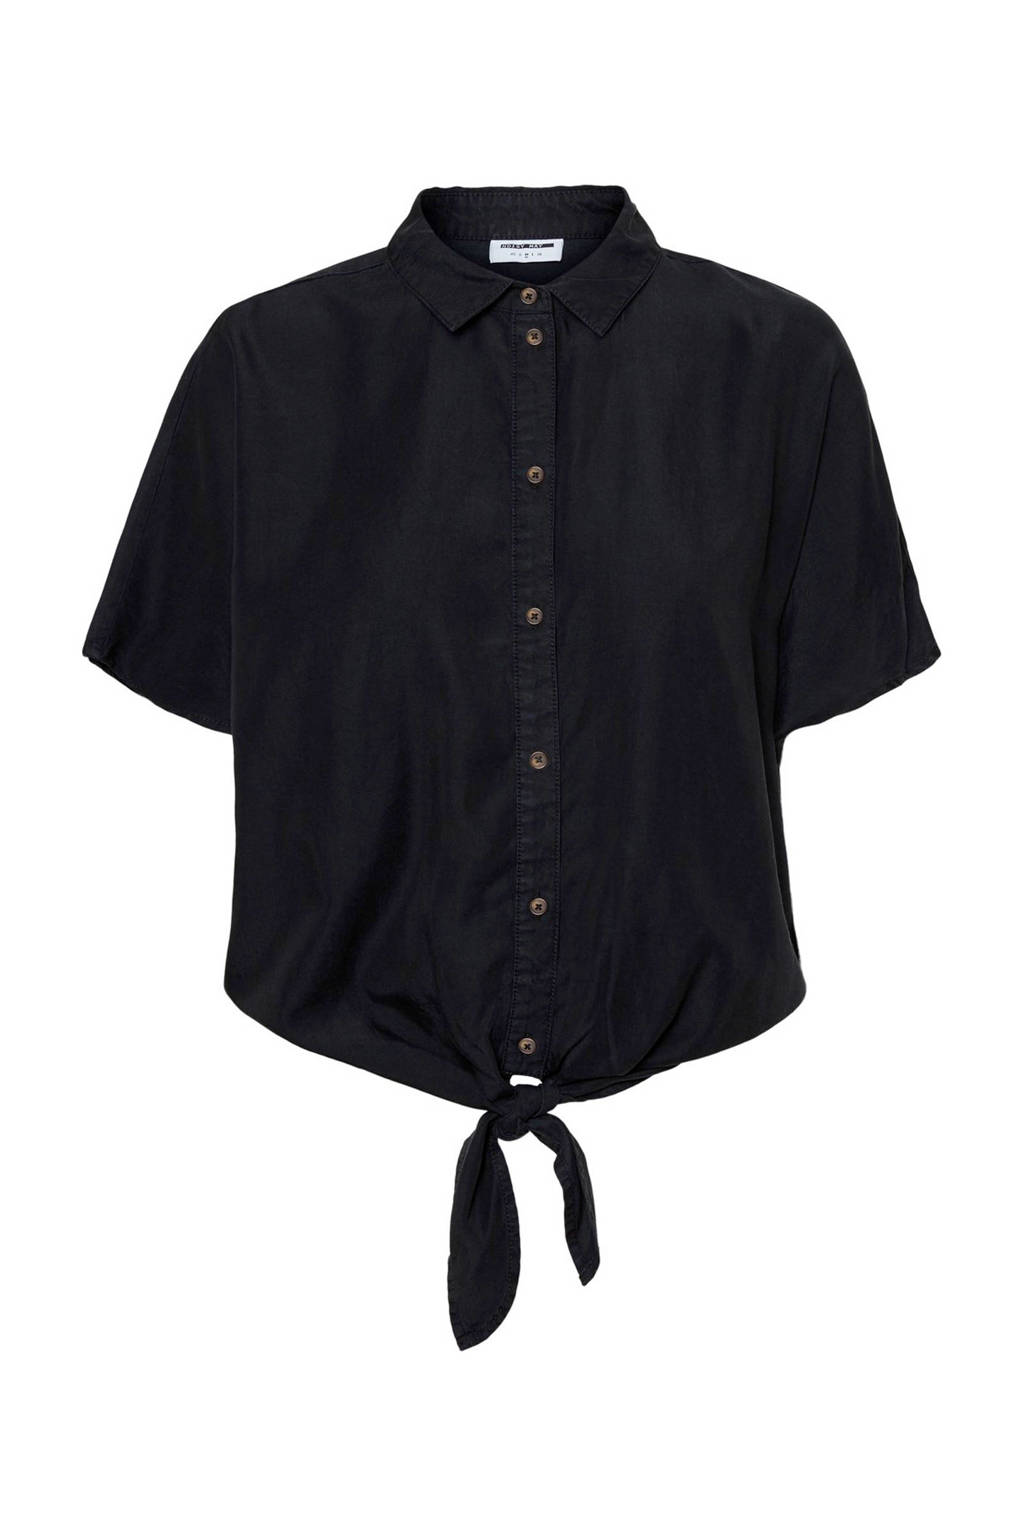 NOISY MAY blouse zwart, Zwart